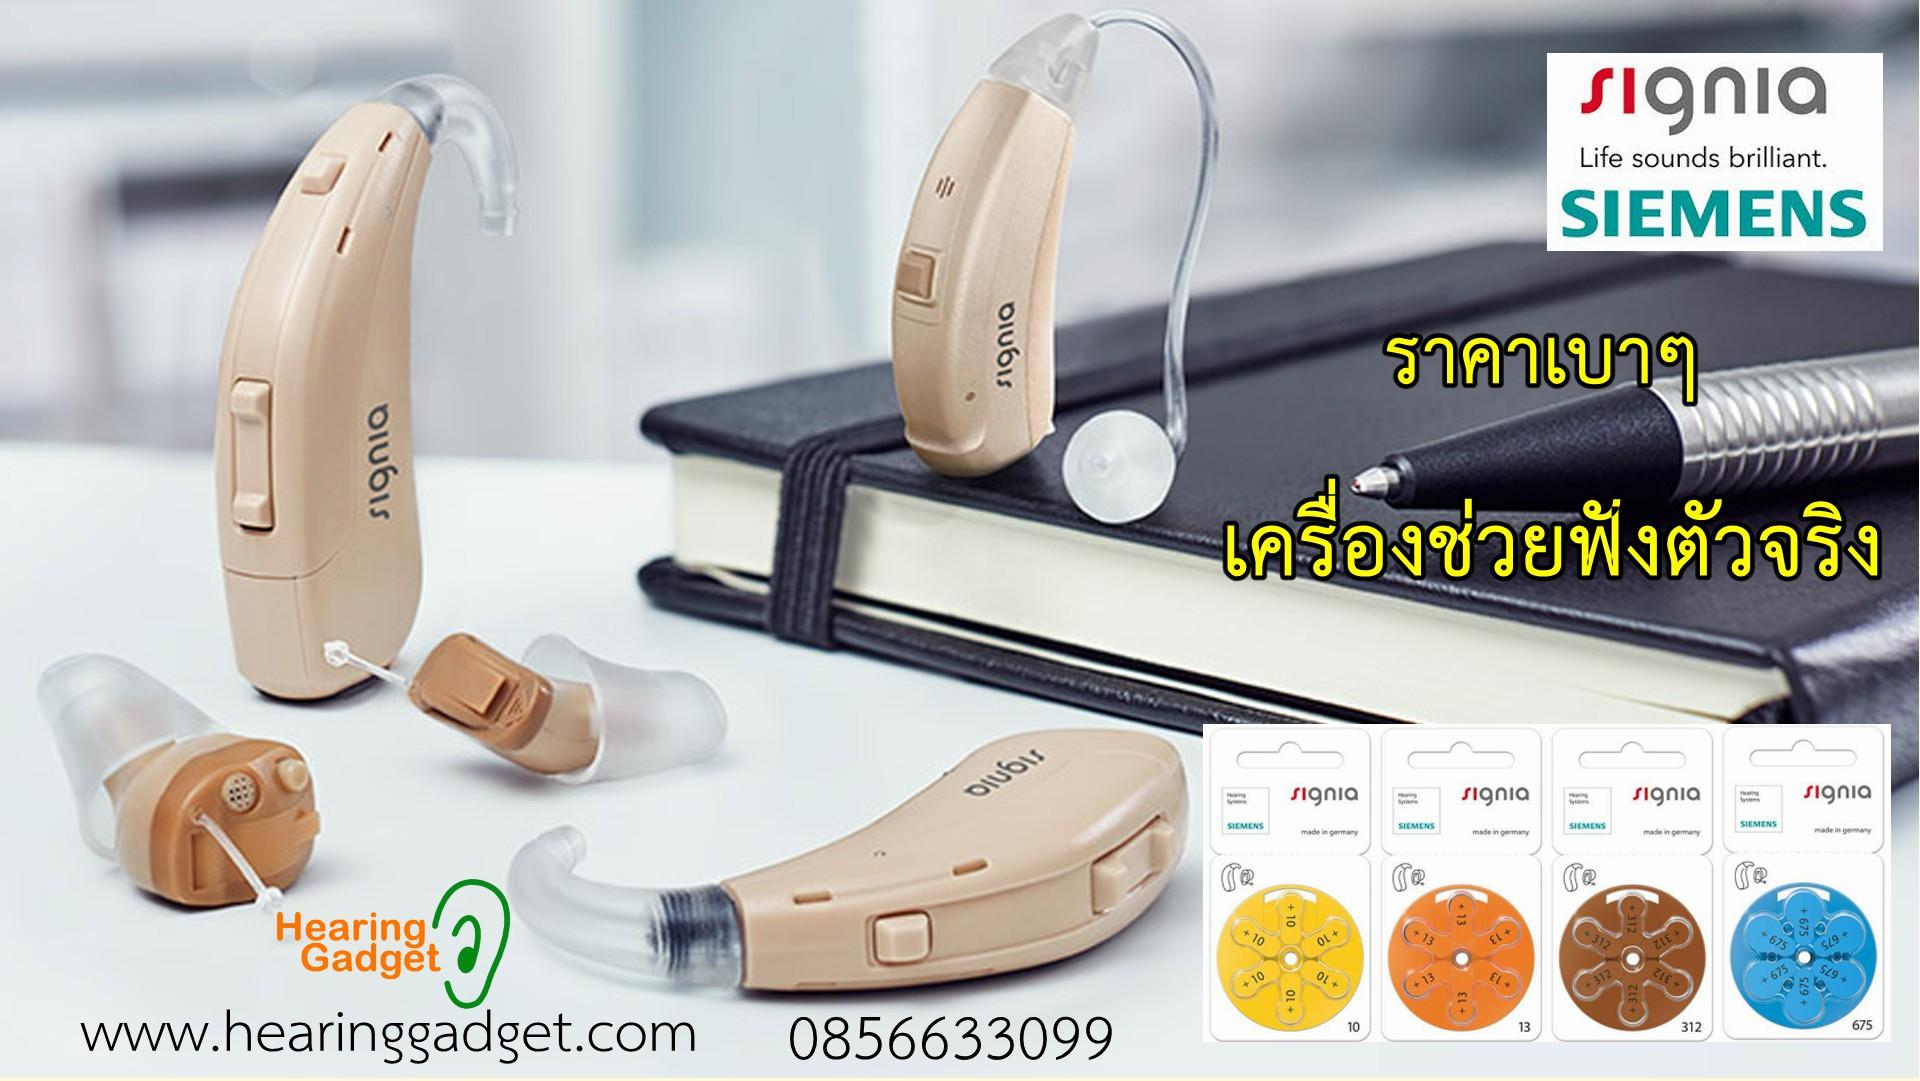 Hearing gadget